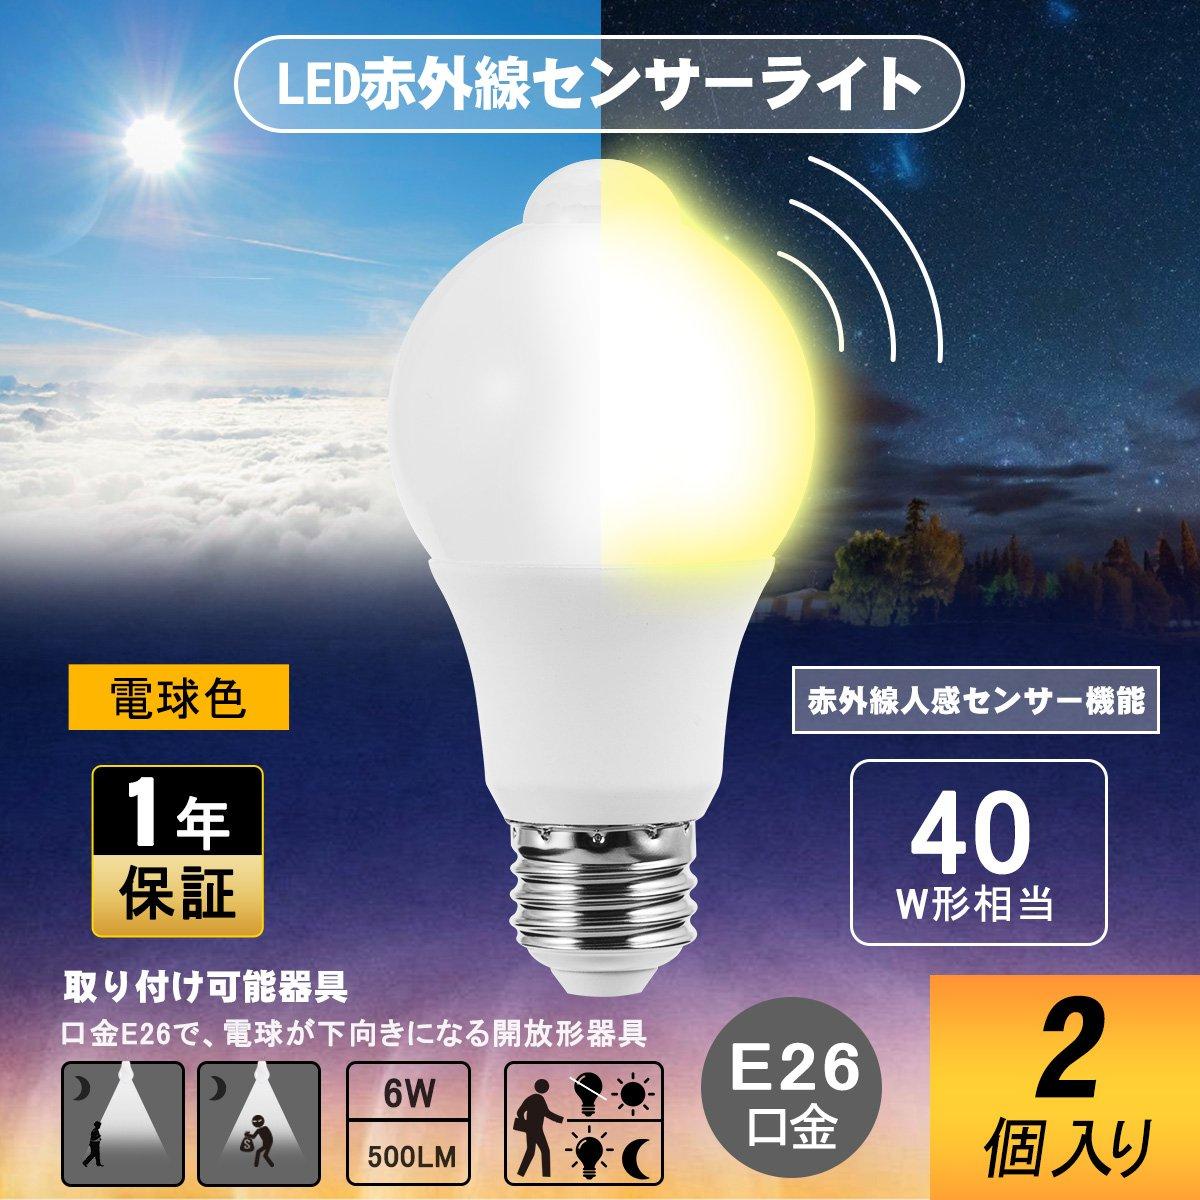 DORESshop LED電球 人感センサー付き E26口金 40W形相当 電球色 500lm 夜間自動点灯 省エネ 防犯 玄関 駐車場 トイレ 廊下 2個入